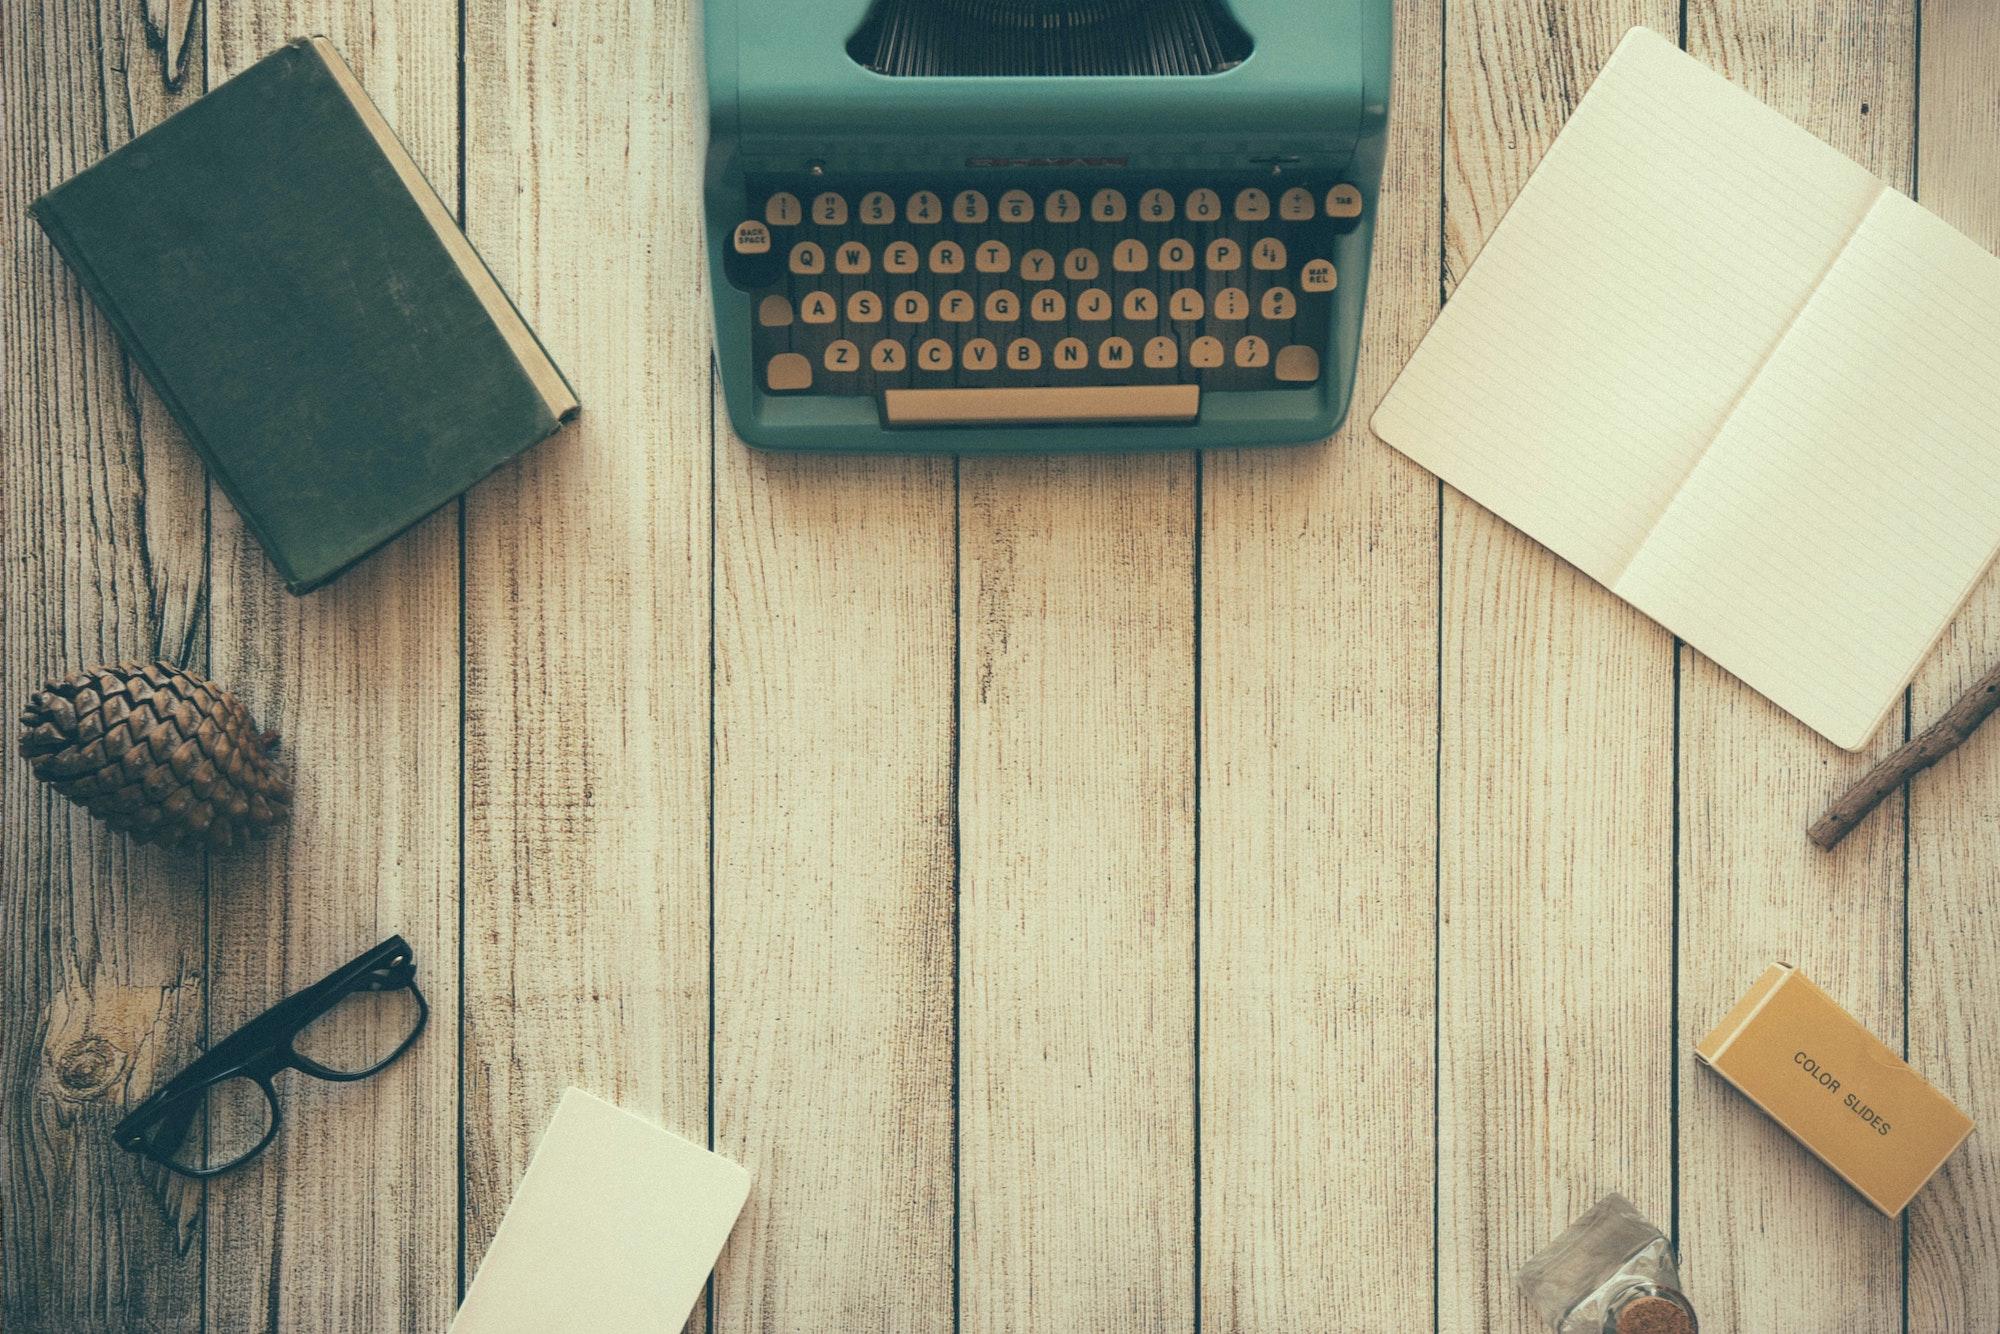 Organised desk with blogging typewriter